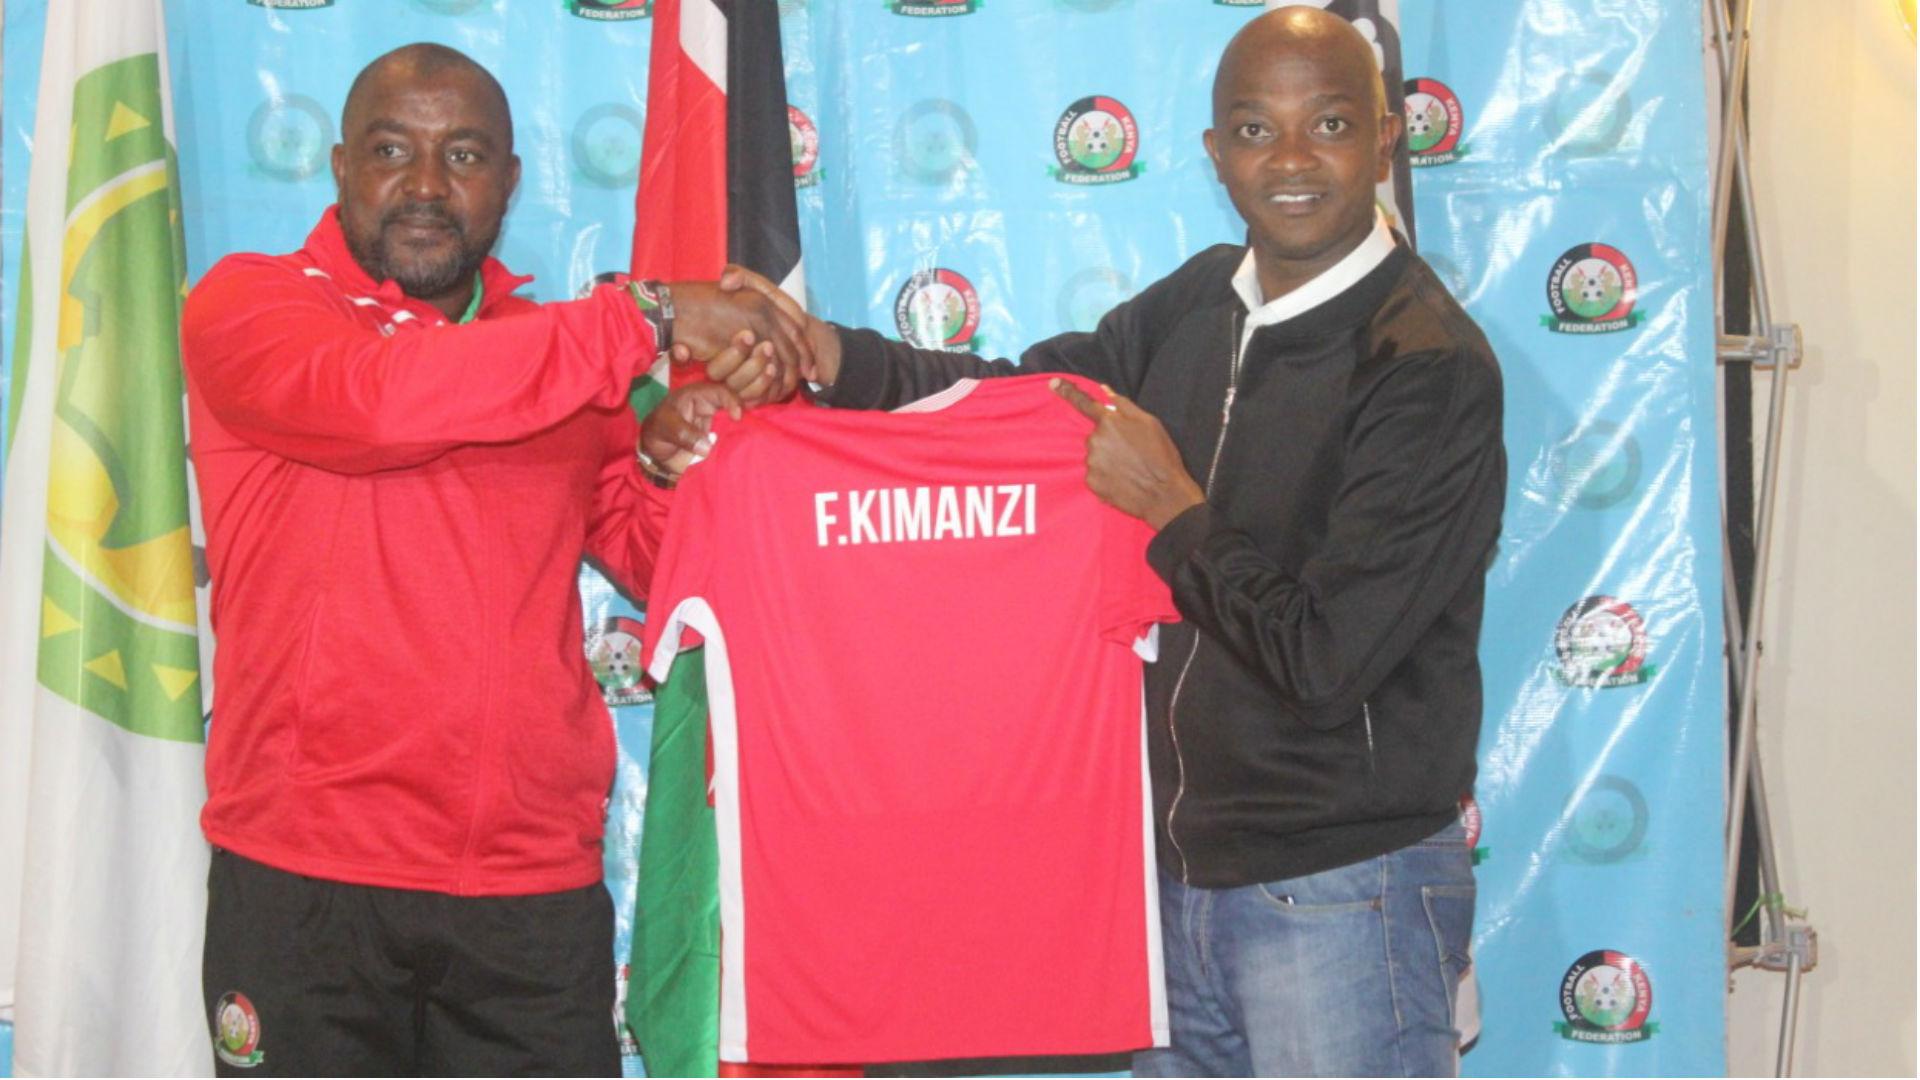 'Were these hired foreigners?' – Kimanzi blasts Mwendwa after claims Kenya lack quality players